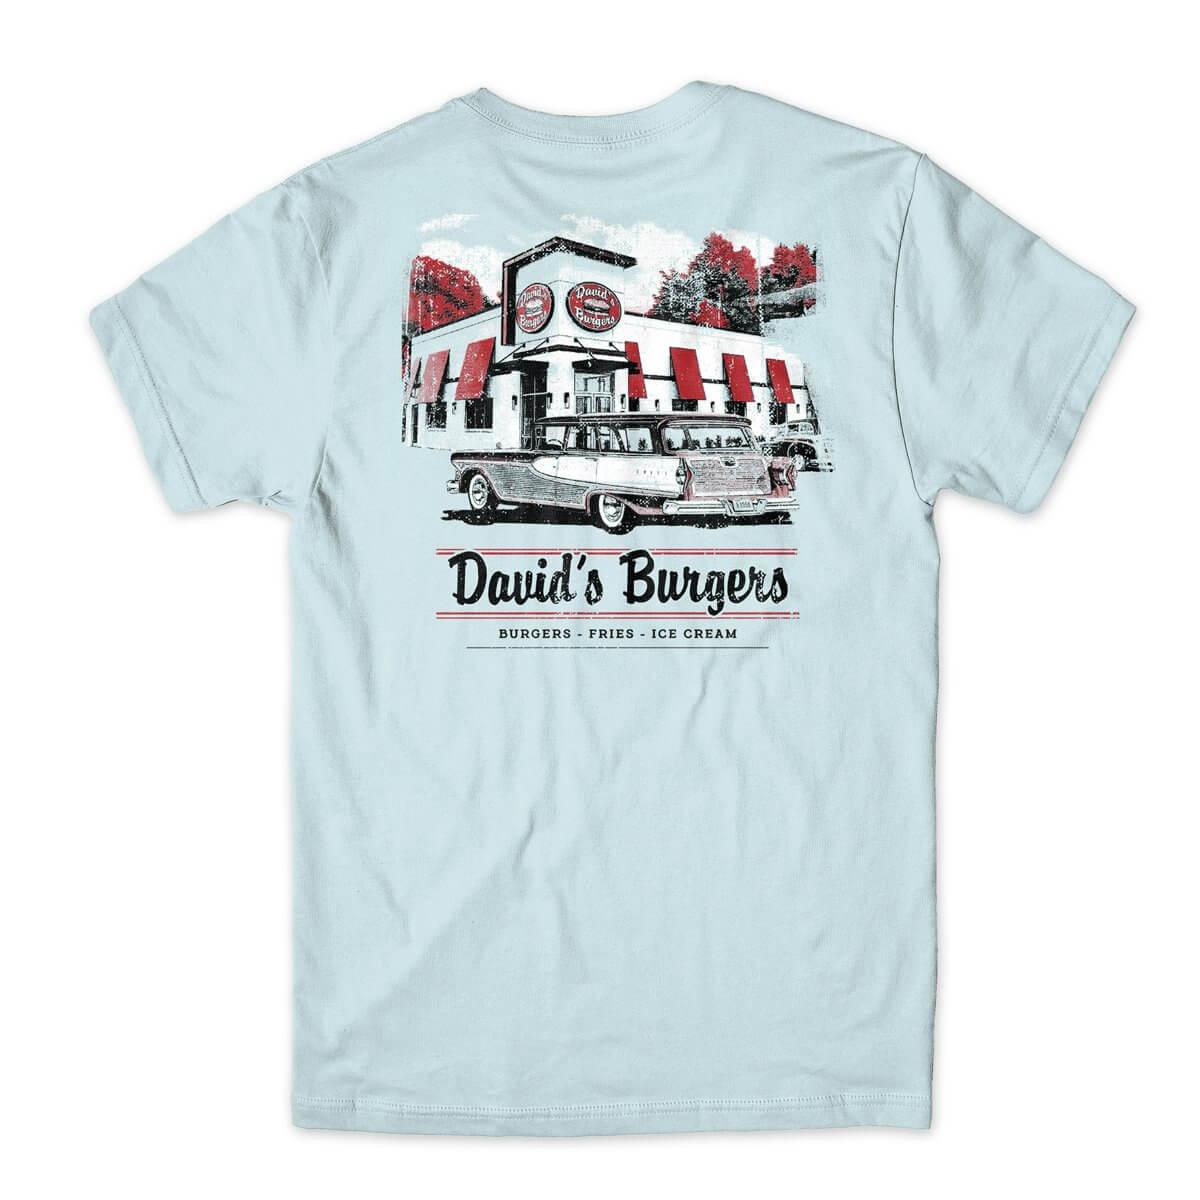 David's Burgers Station Wagon tshirt